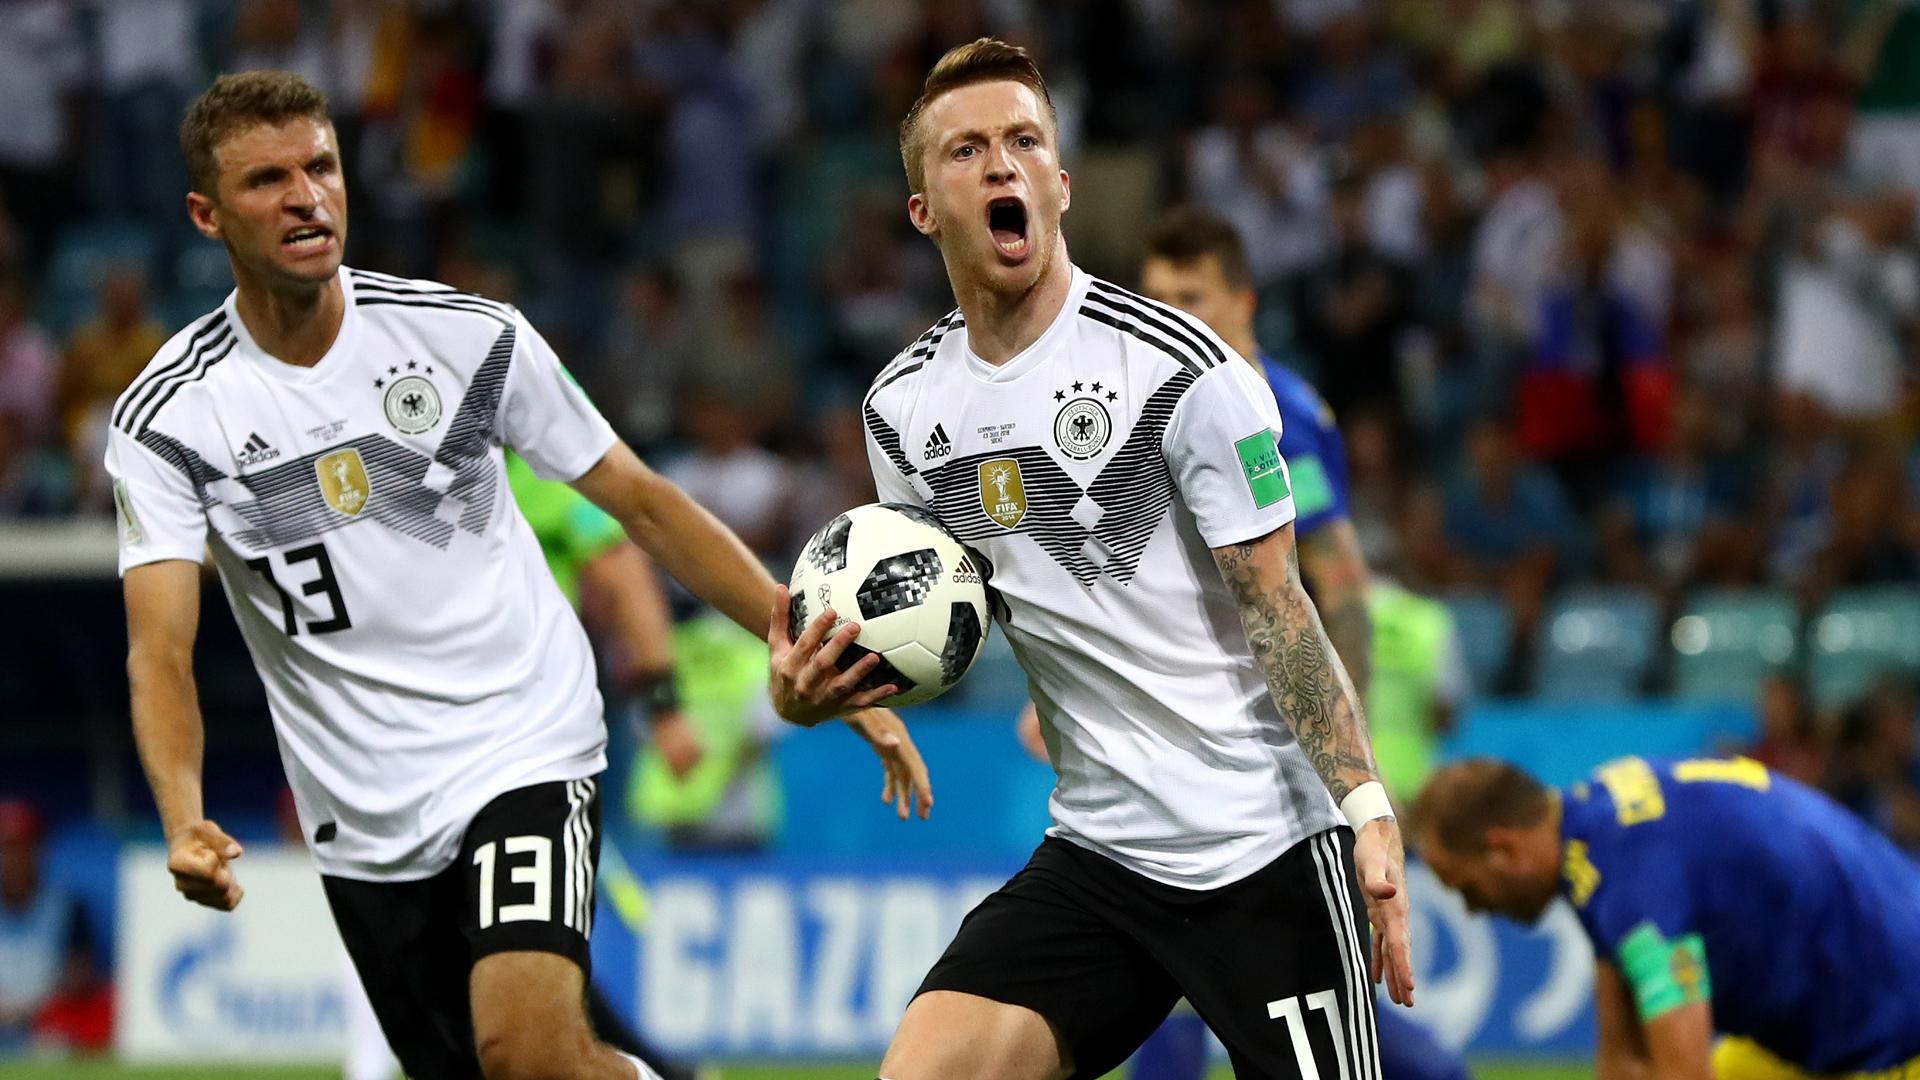 Germany Sweden Marco Reus Thomas Müller